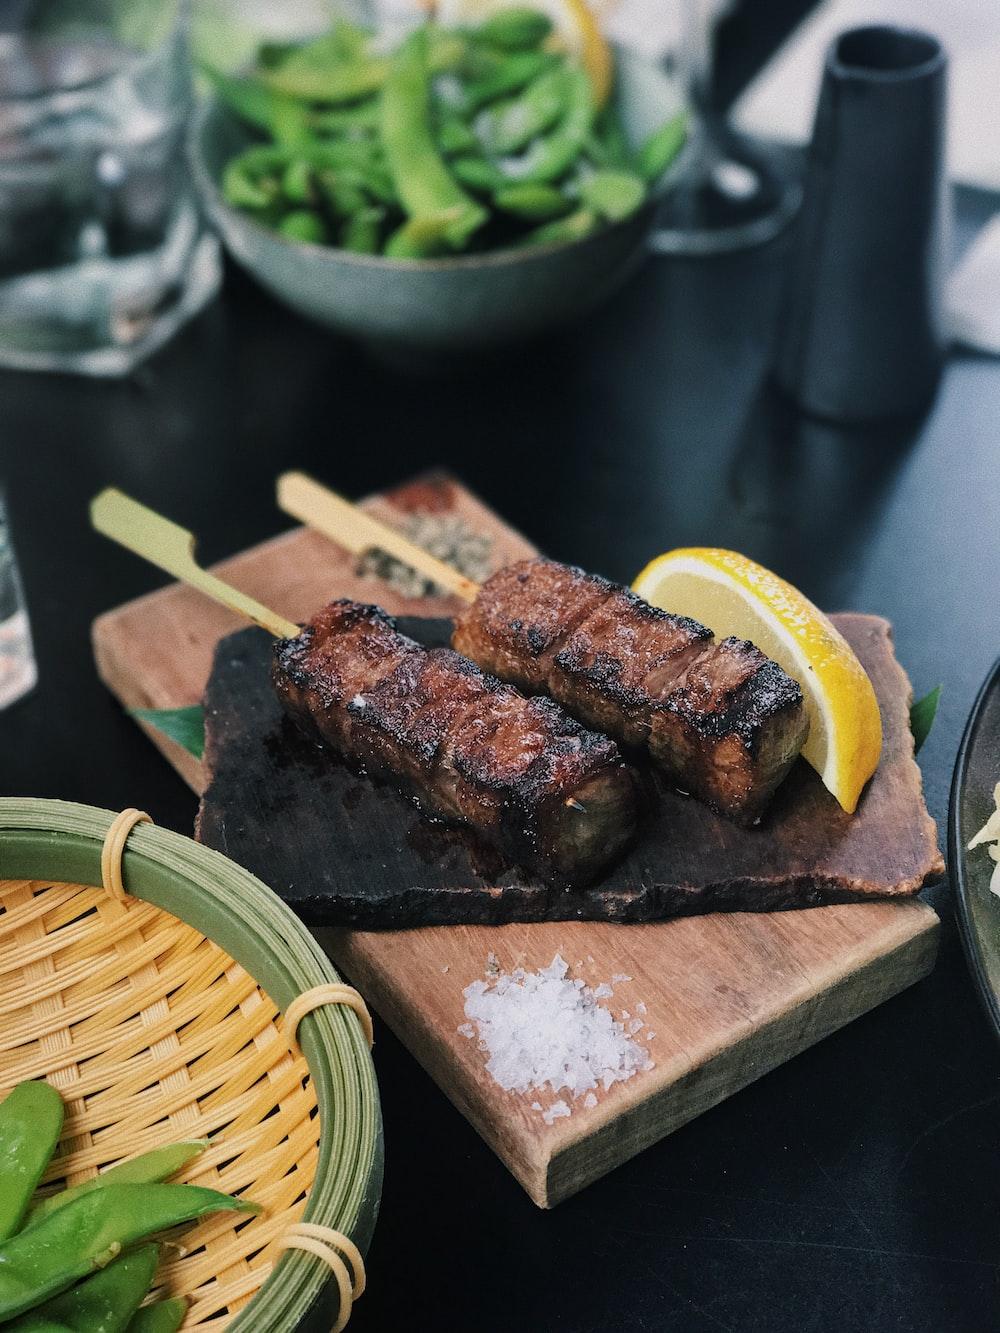 grilled steak on chopping board